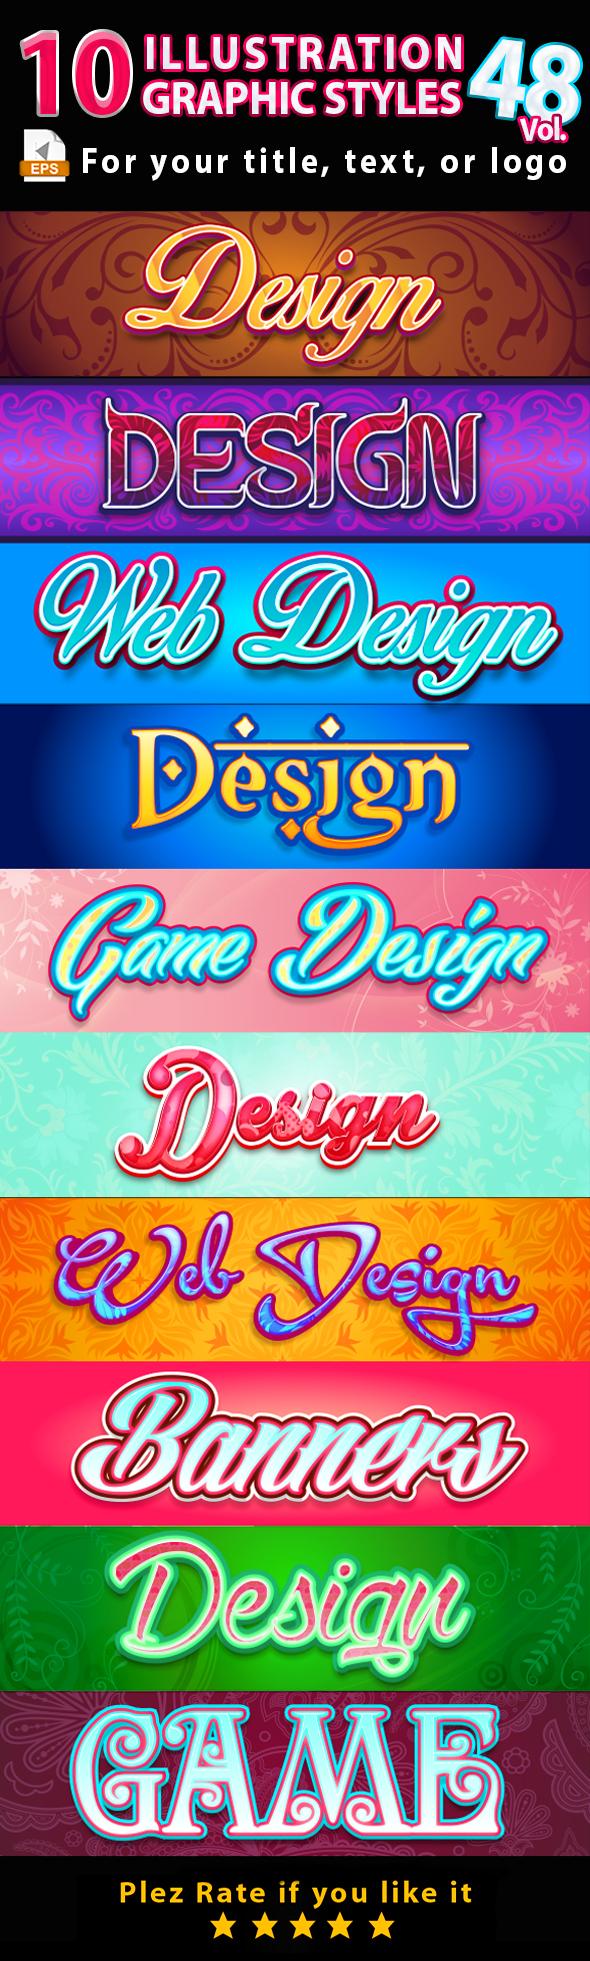 10 Illustrator Graphic Styles Vol.48 - Styles Illustrator